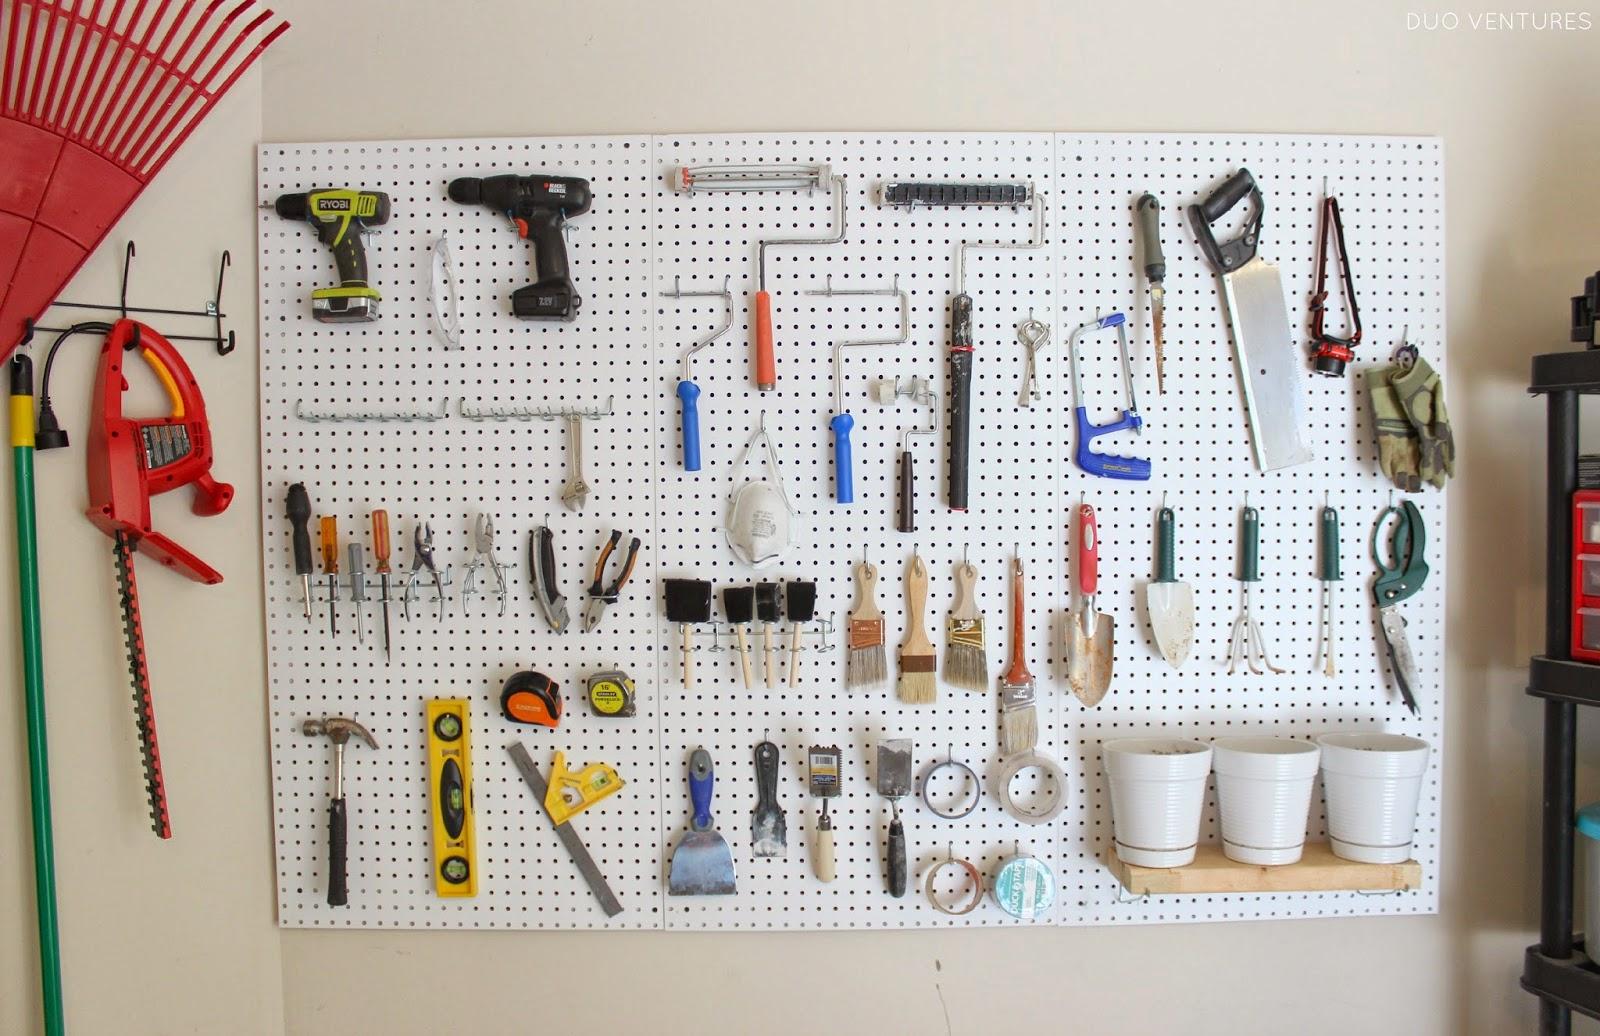 Duo Ventures Organizing Tool Pegboard